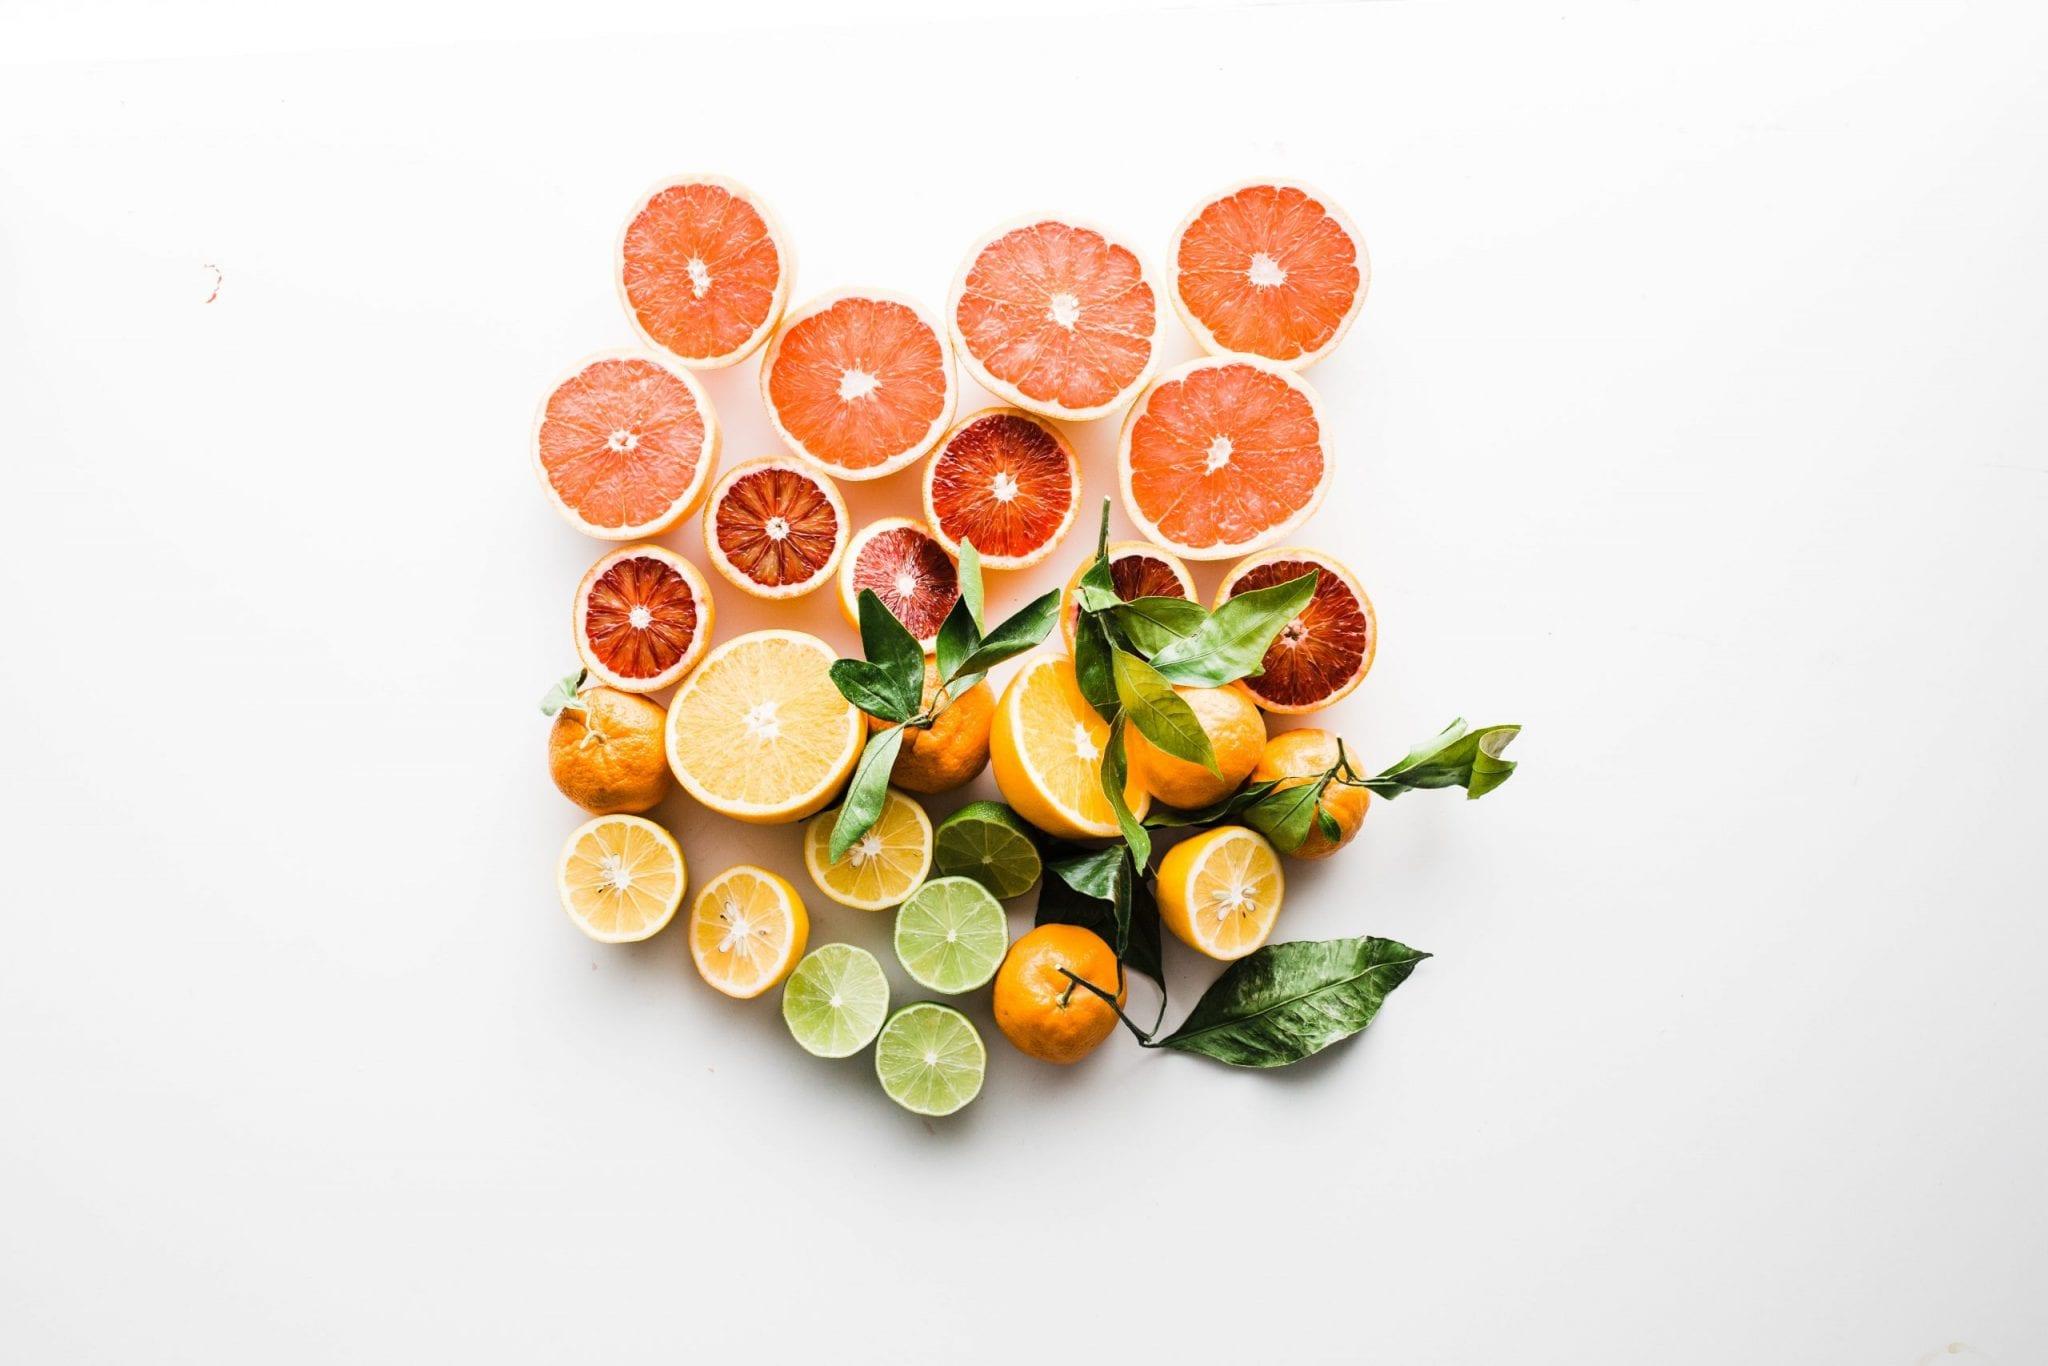 immune booster supplements